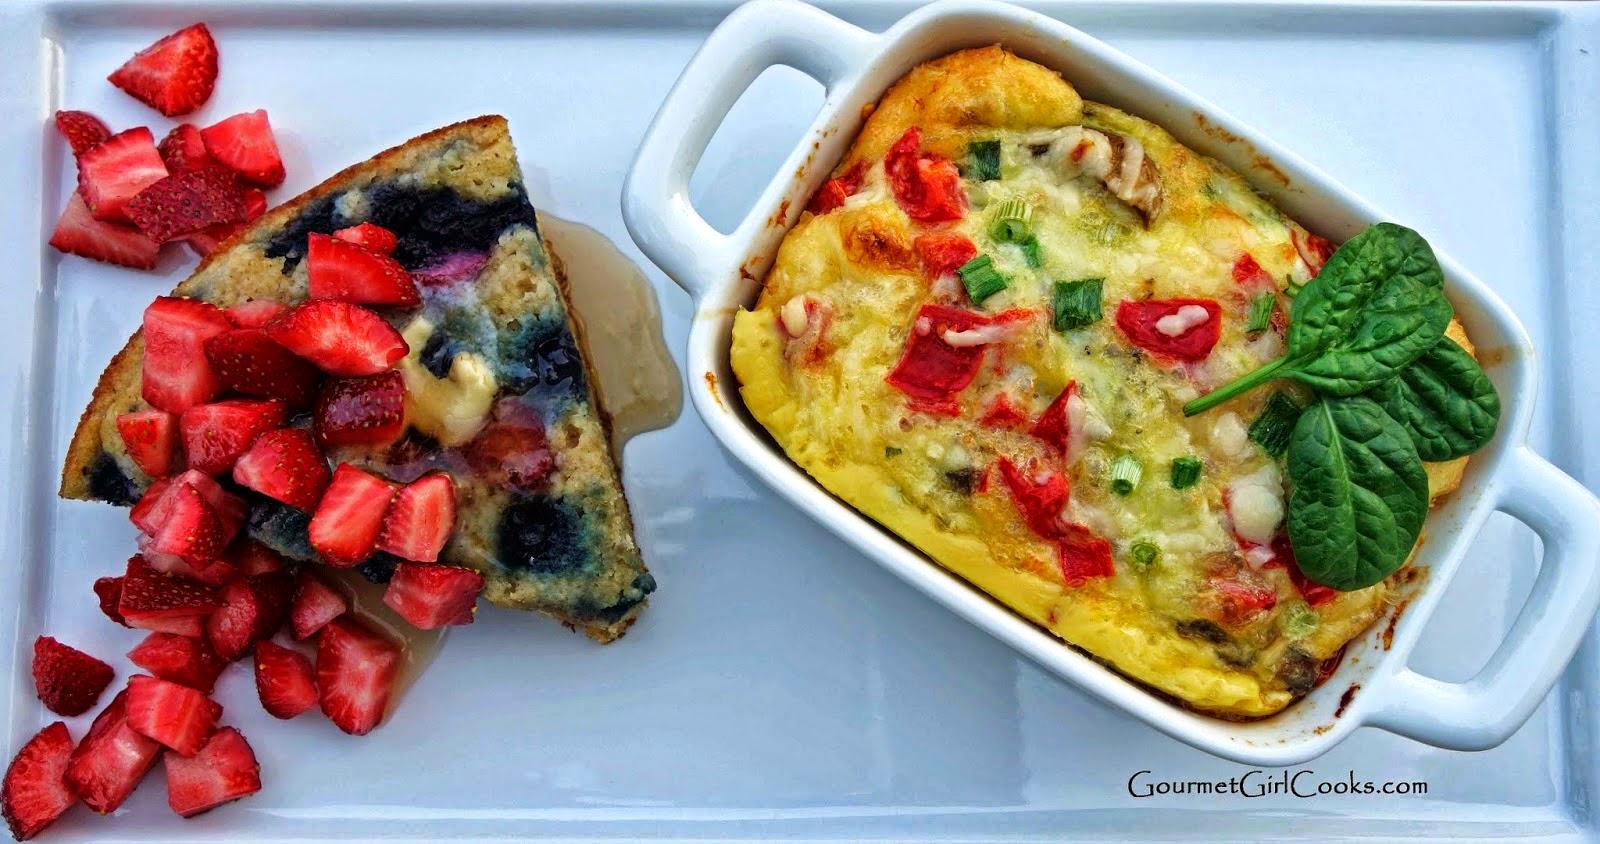 Gourmet Girl Cooks Mini Breakfast Casseroles You Say Egg Strata